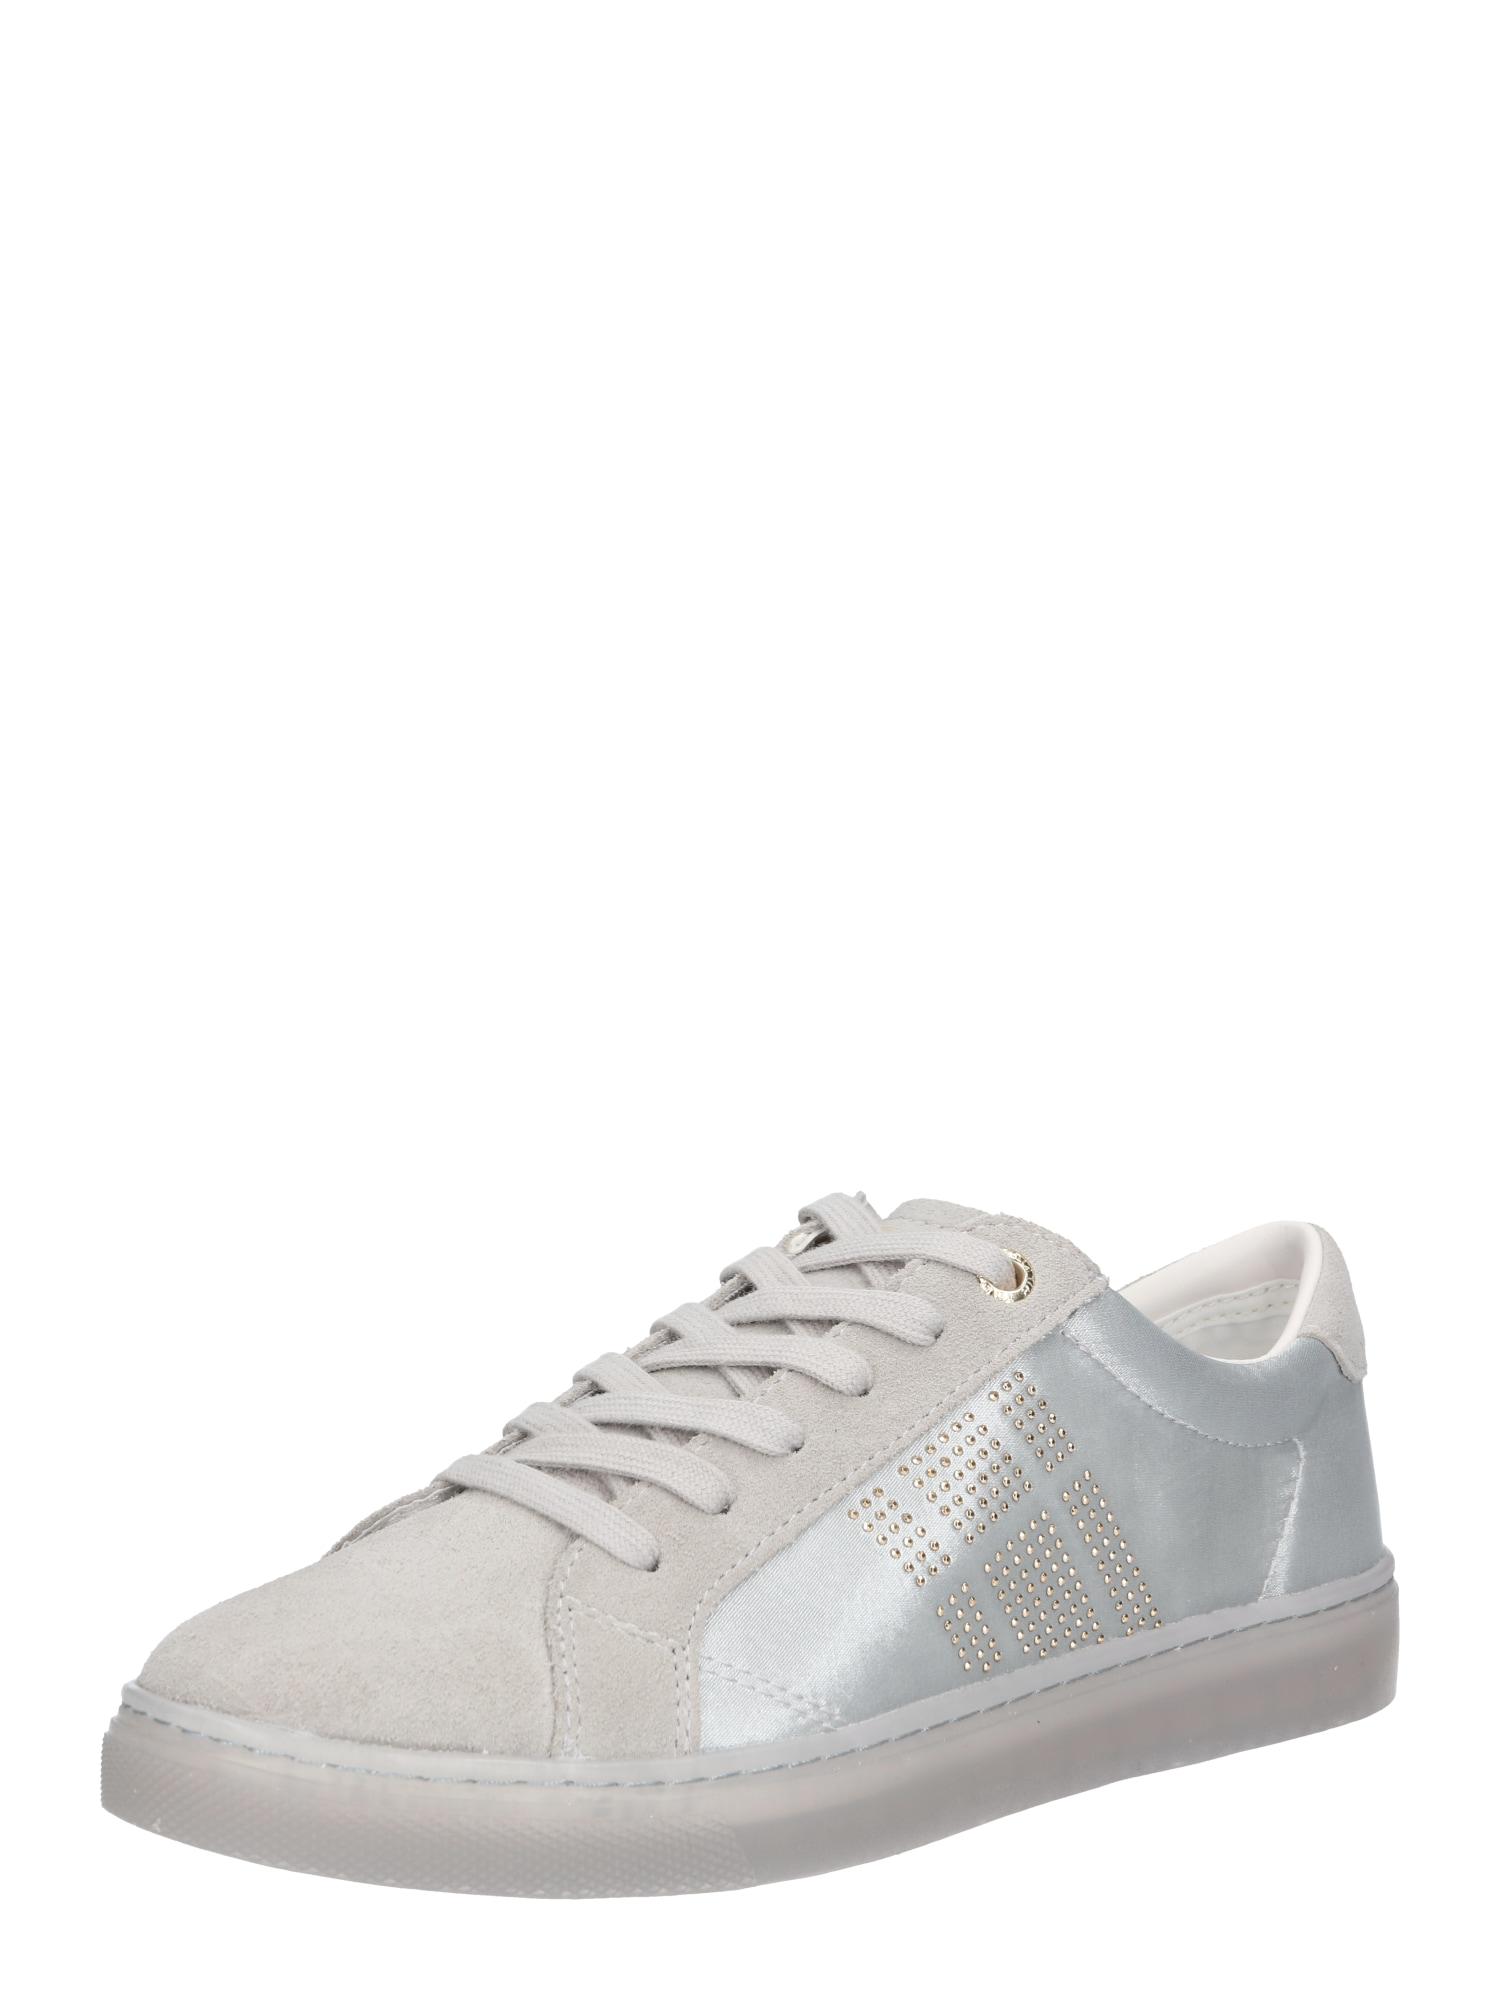 f55f78ca554 Tommy Hilfiger Dames Sneakers Laag Sparkle Satin Essential Lichtgrijs tommy  hilfiger kopen in de aanbieding